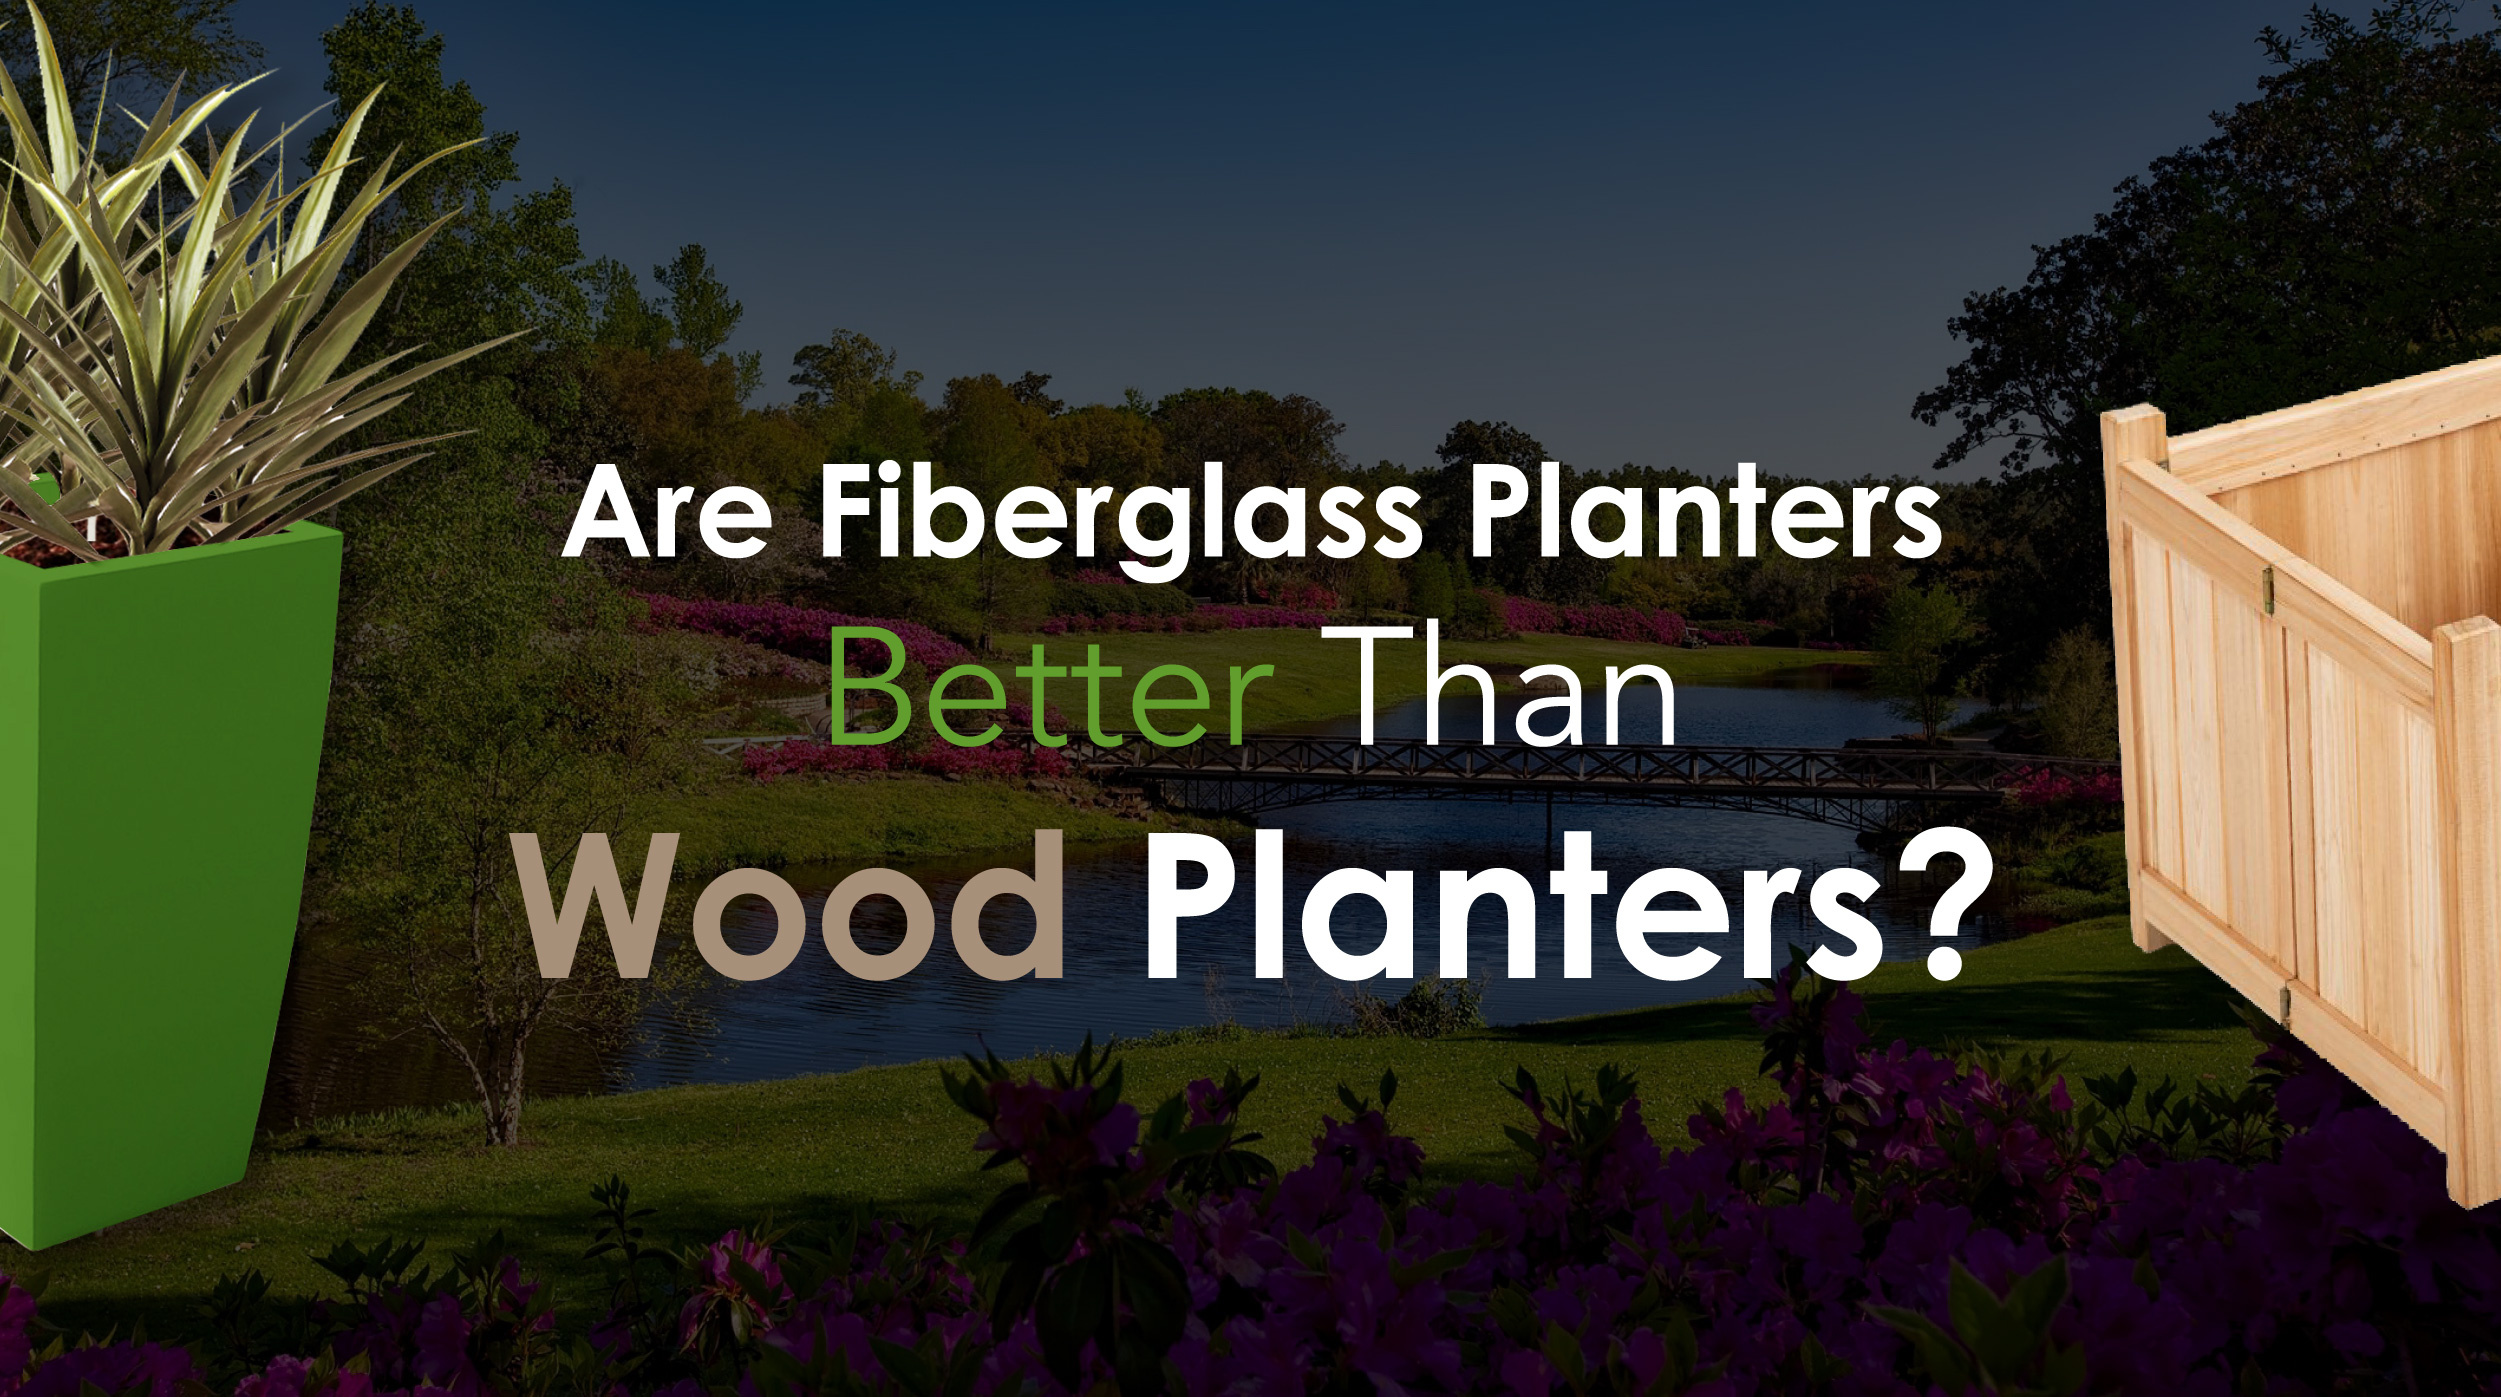 Are Fiberglass Planters Better Than Wood Planters?